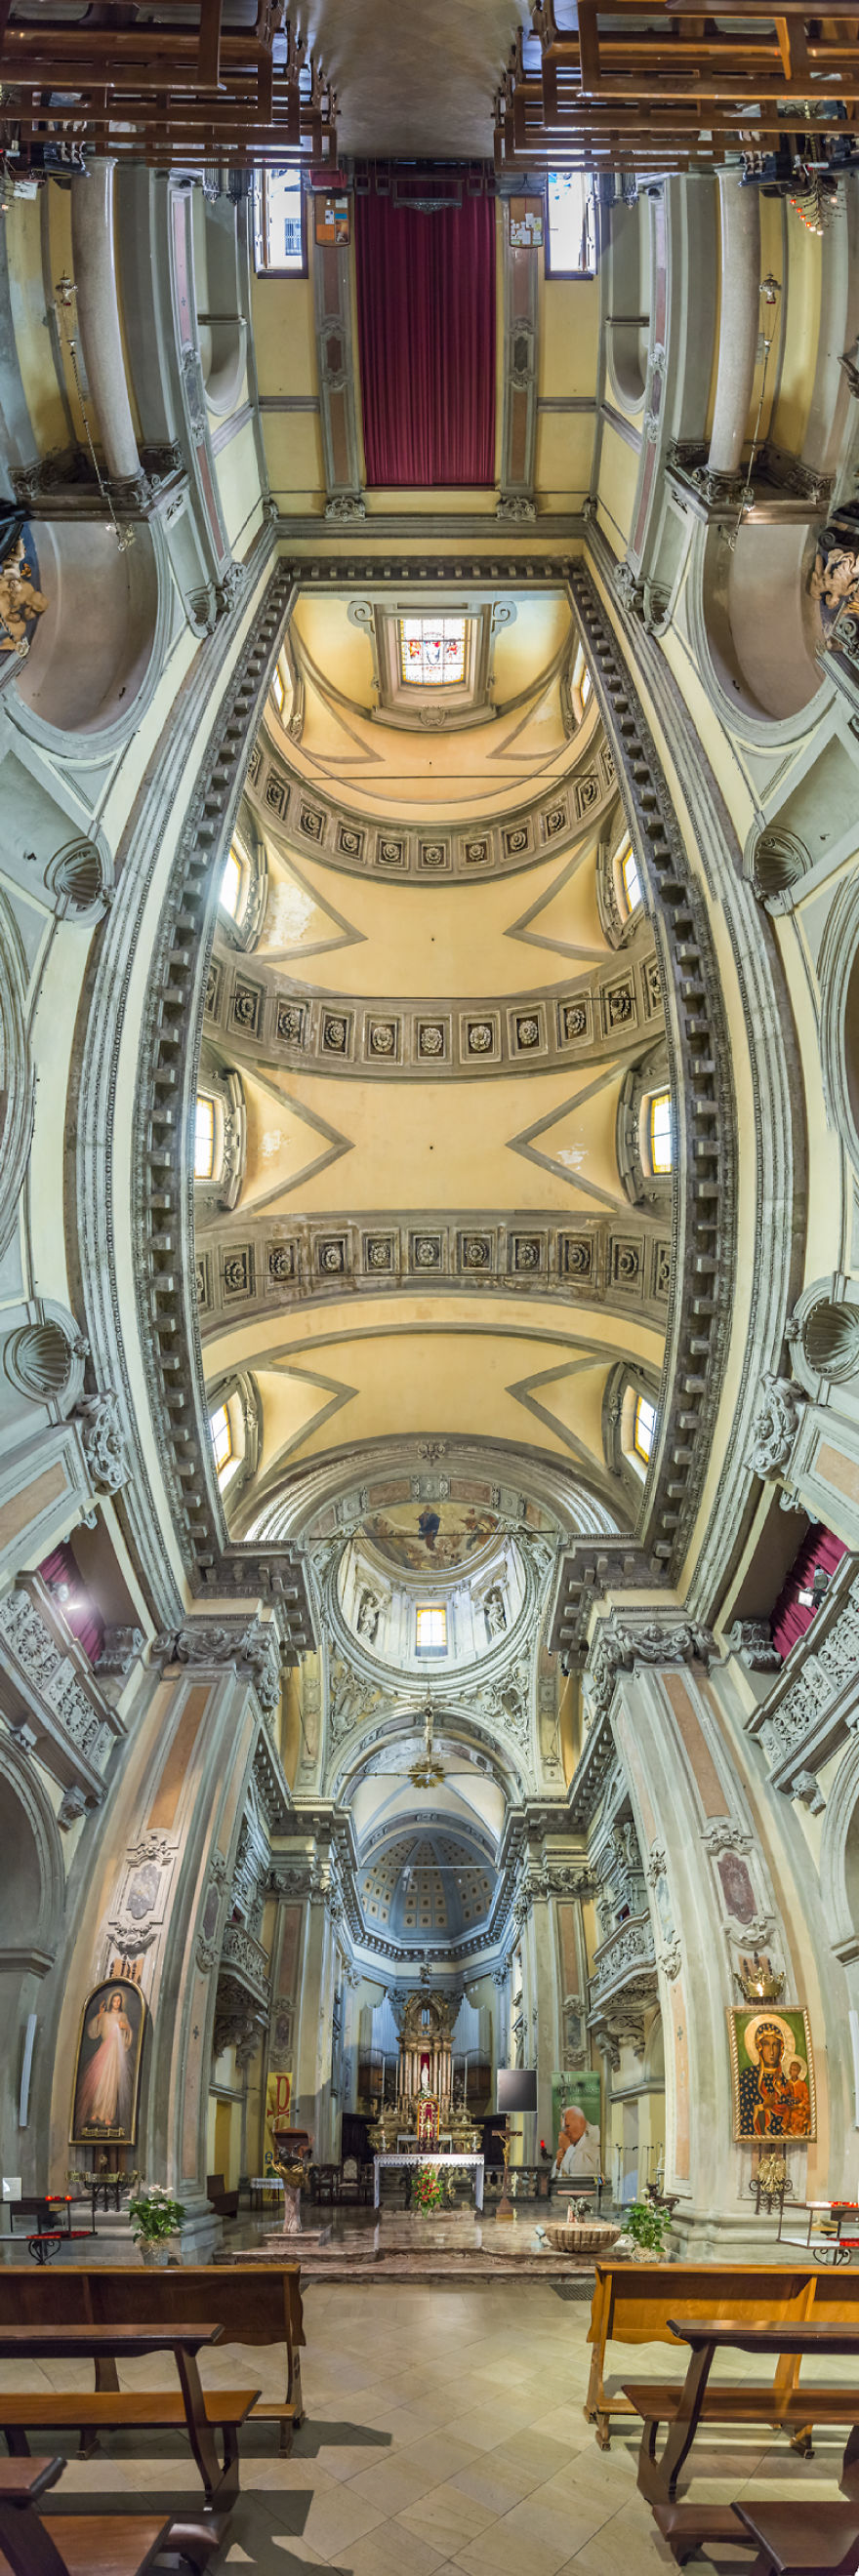 catedrales fotografiadas vertical 13